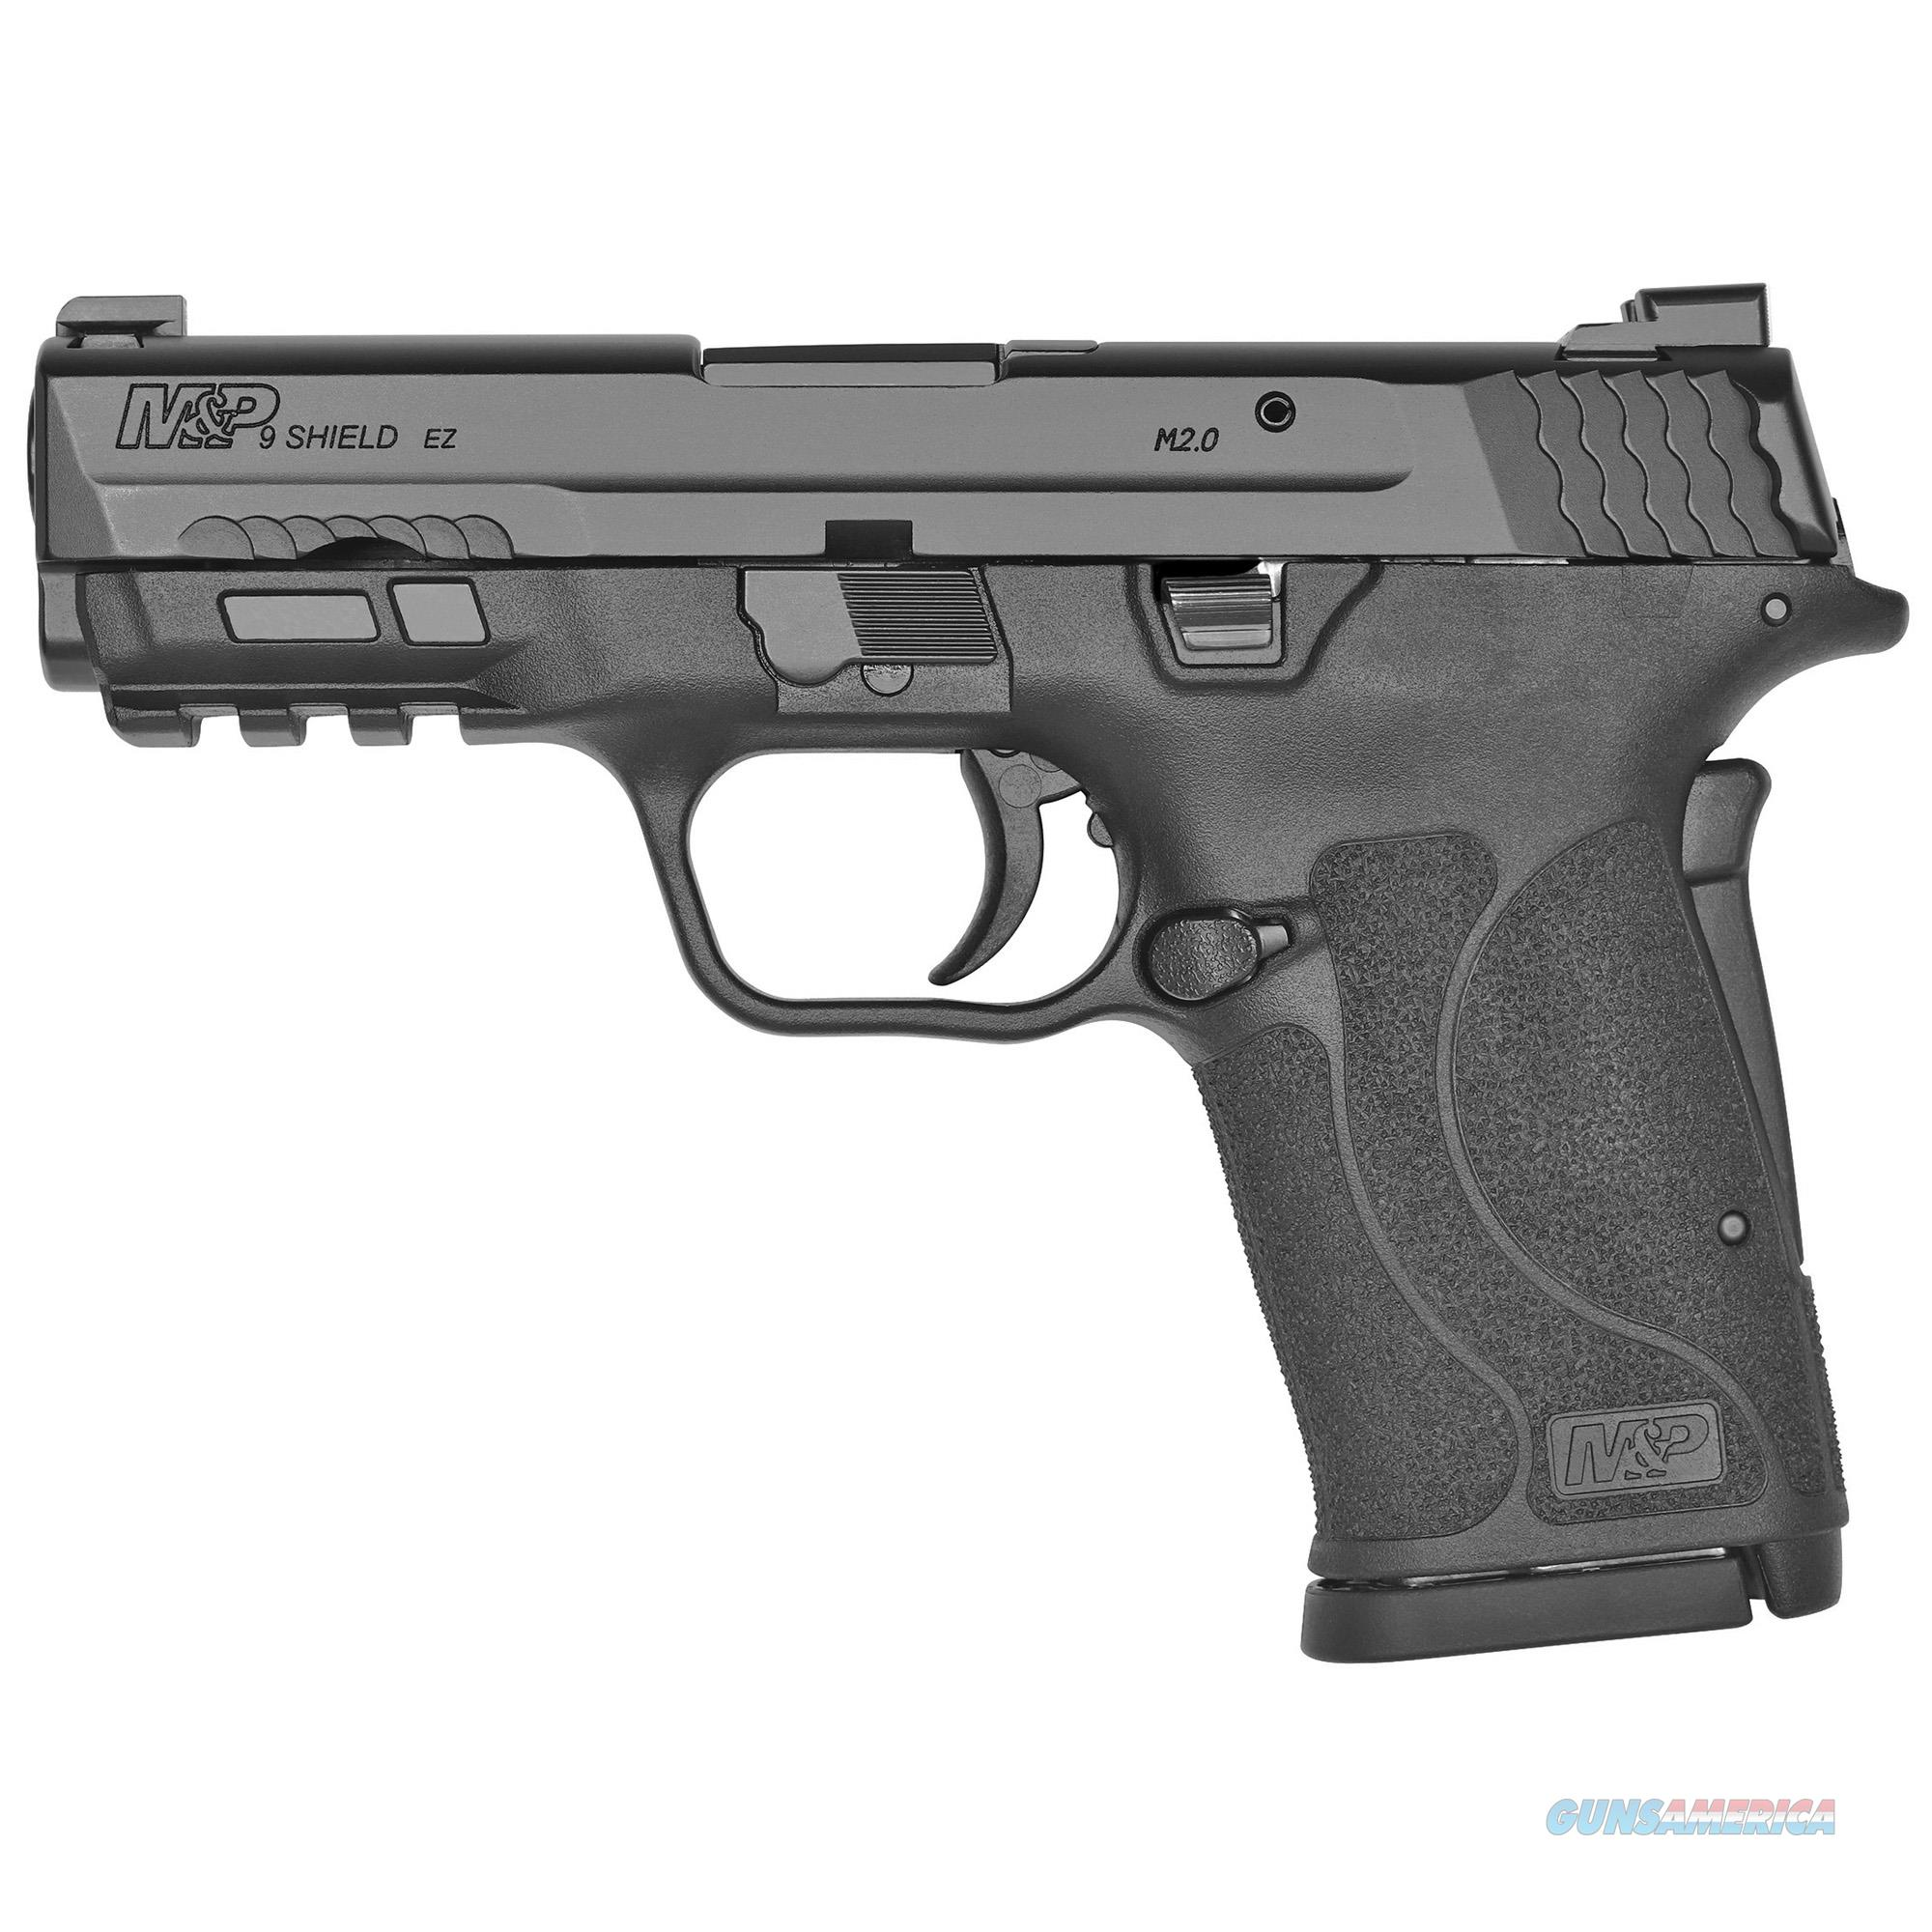 Smith & Wesson M&p 9, S&w M&p9shld  13002  *ma*9m 3.6  2.0 Ez Nts Ns 8r  Guns > Pistols > 1911 Pistol Copies (non-Colt)